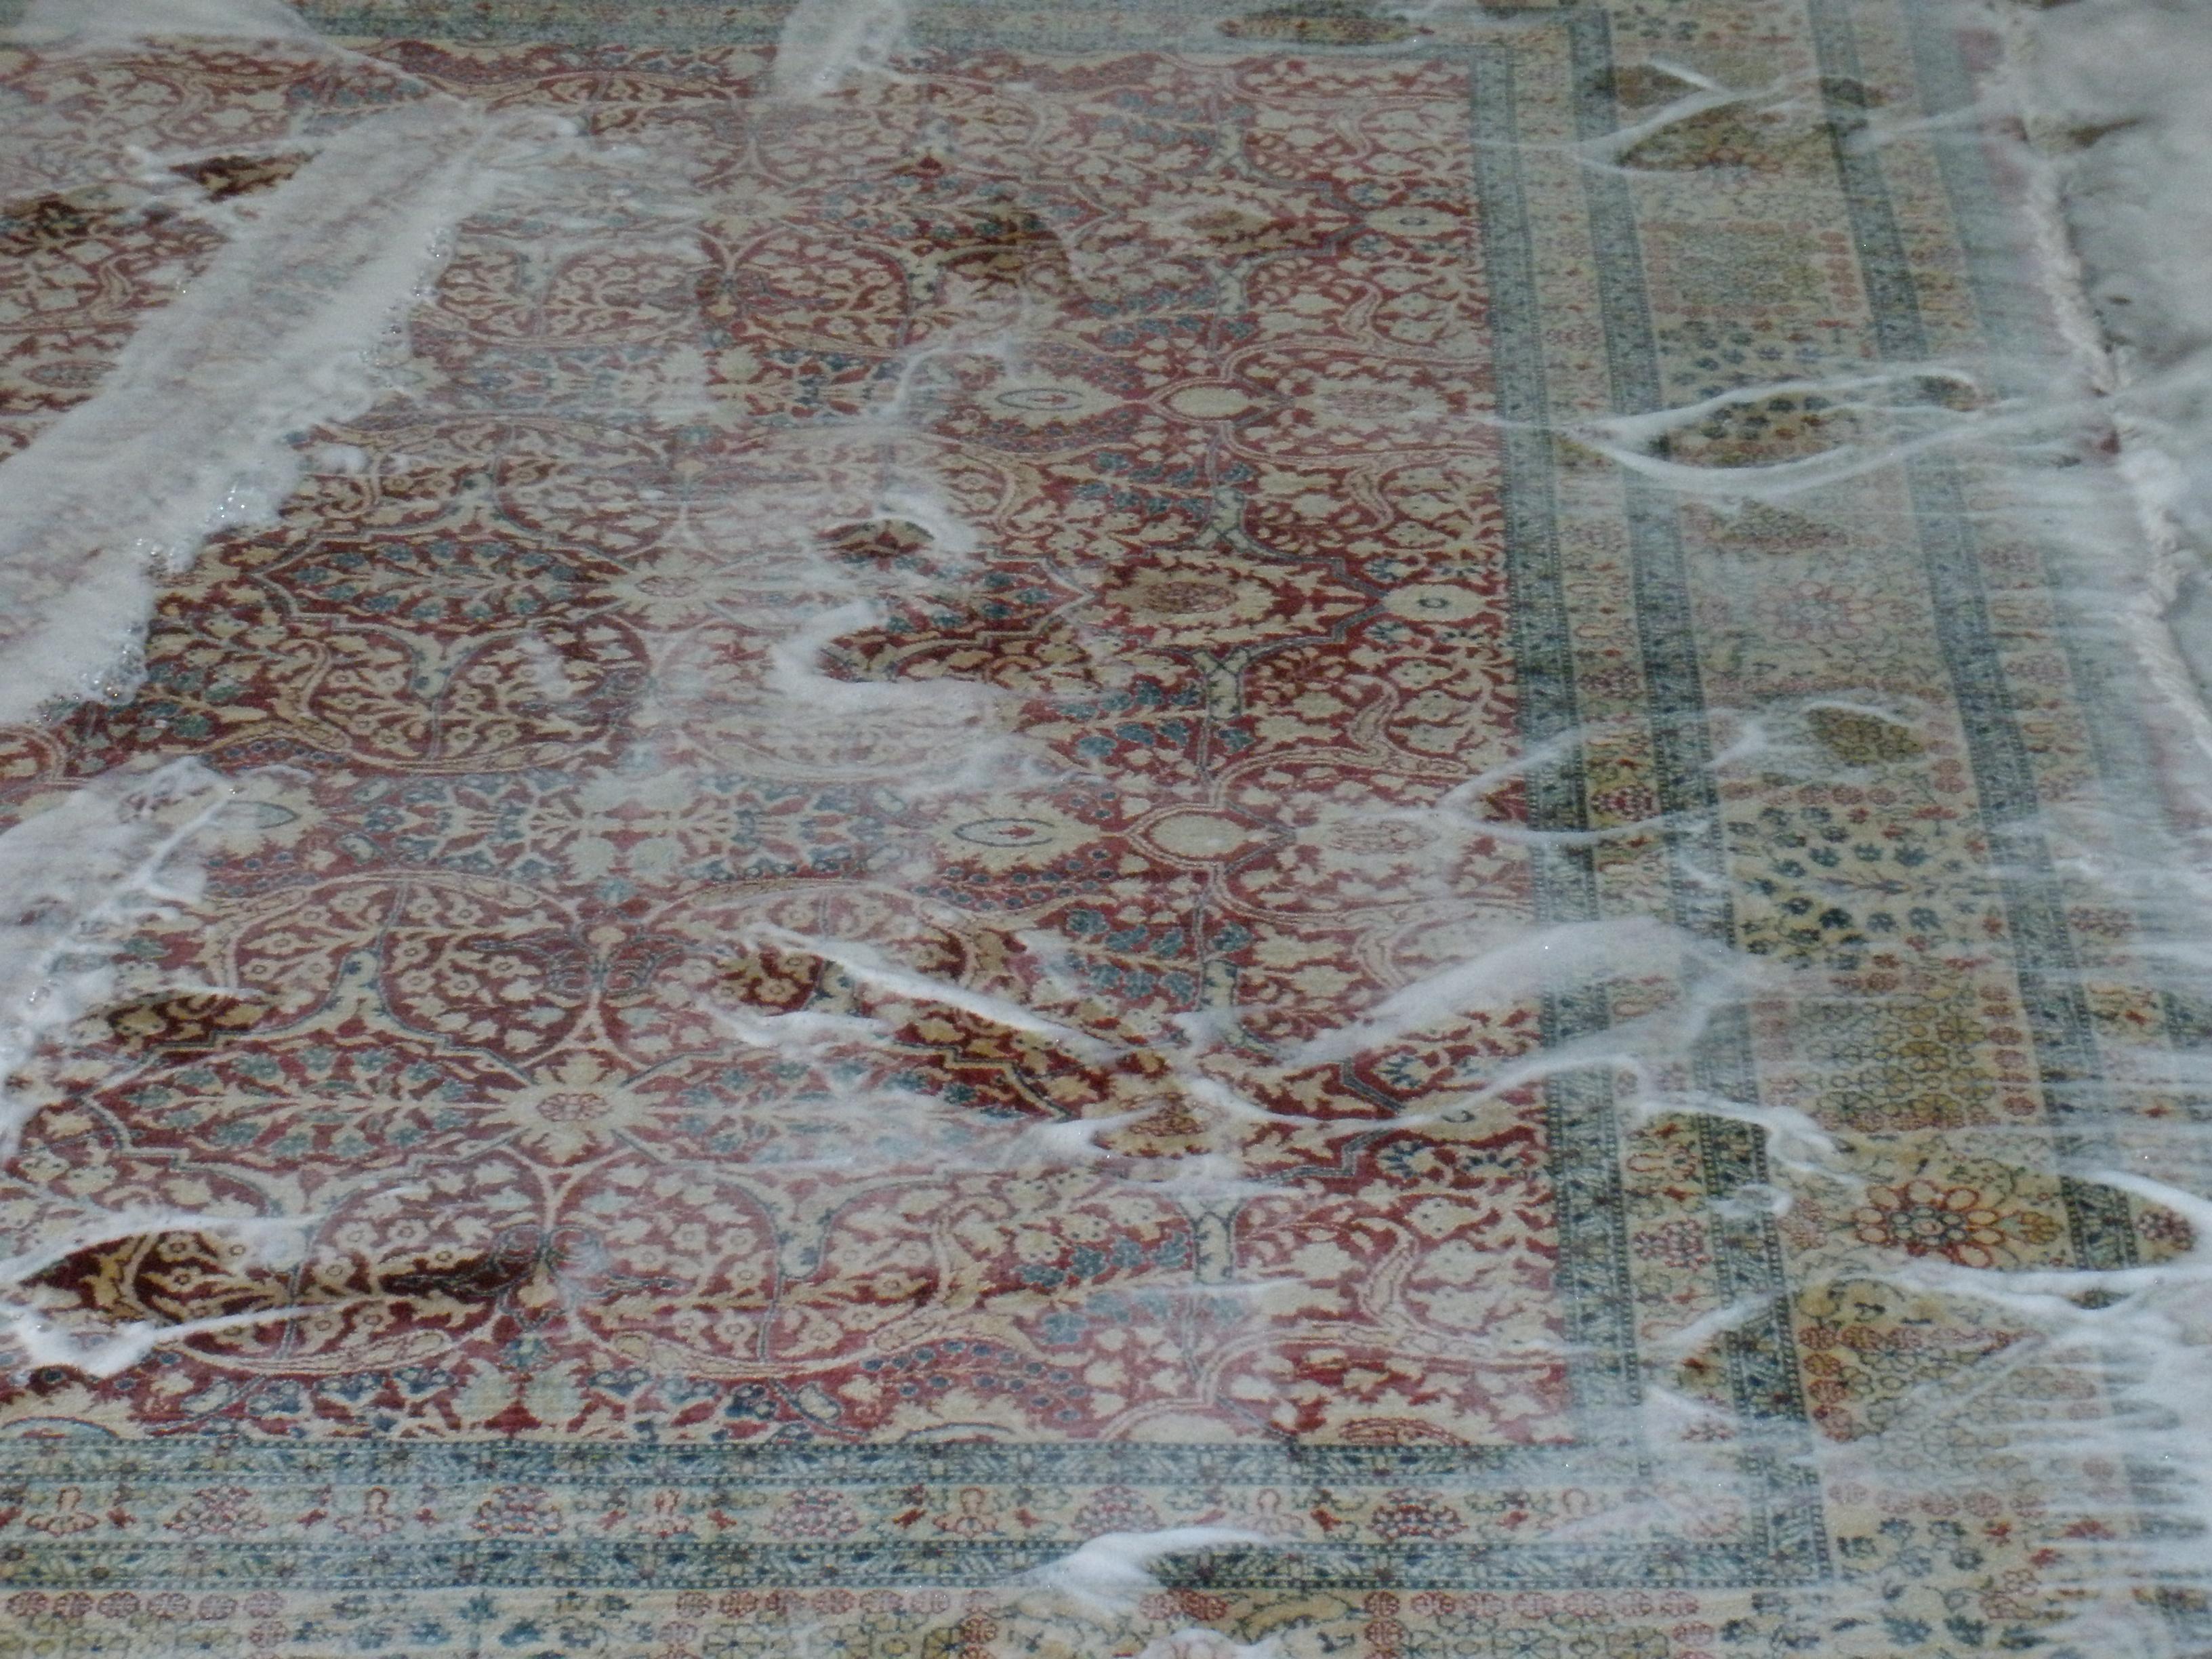 Rug Restoration & Oriental Rug Cleaning